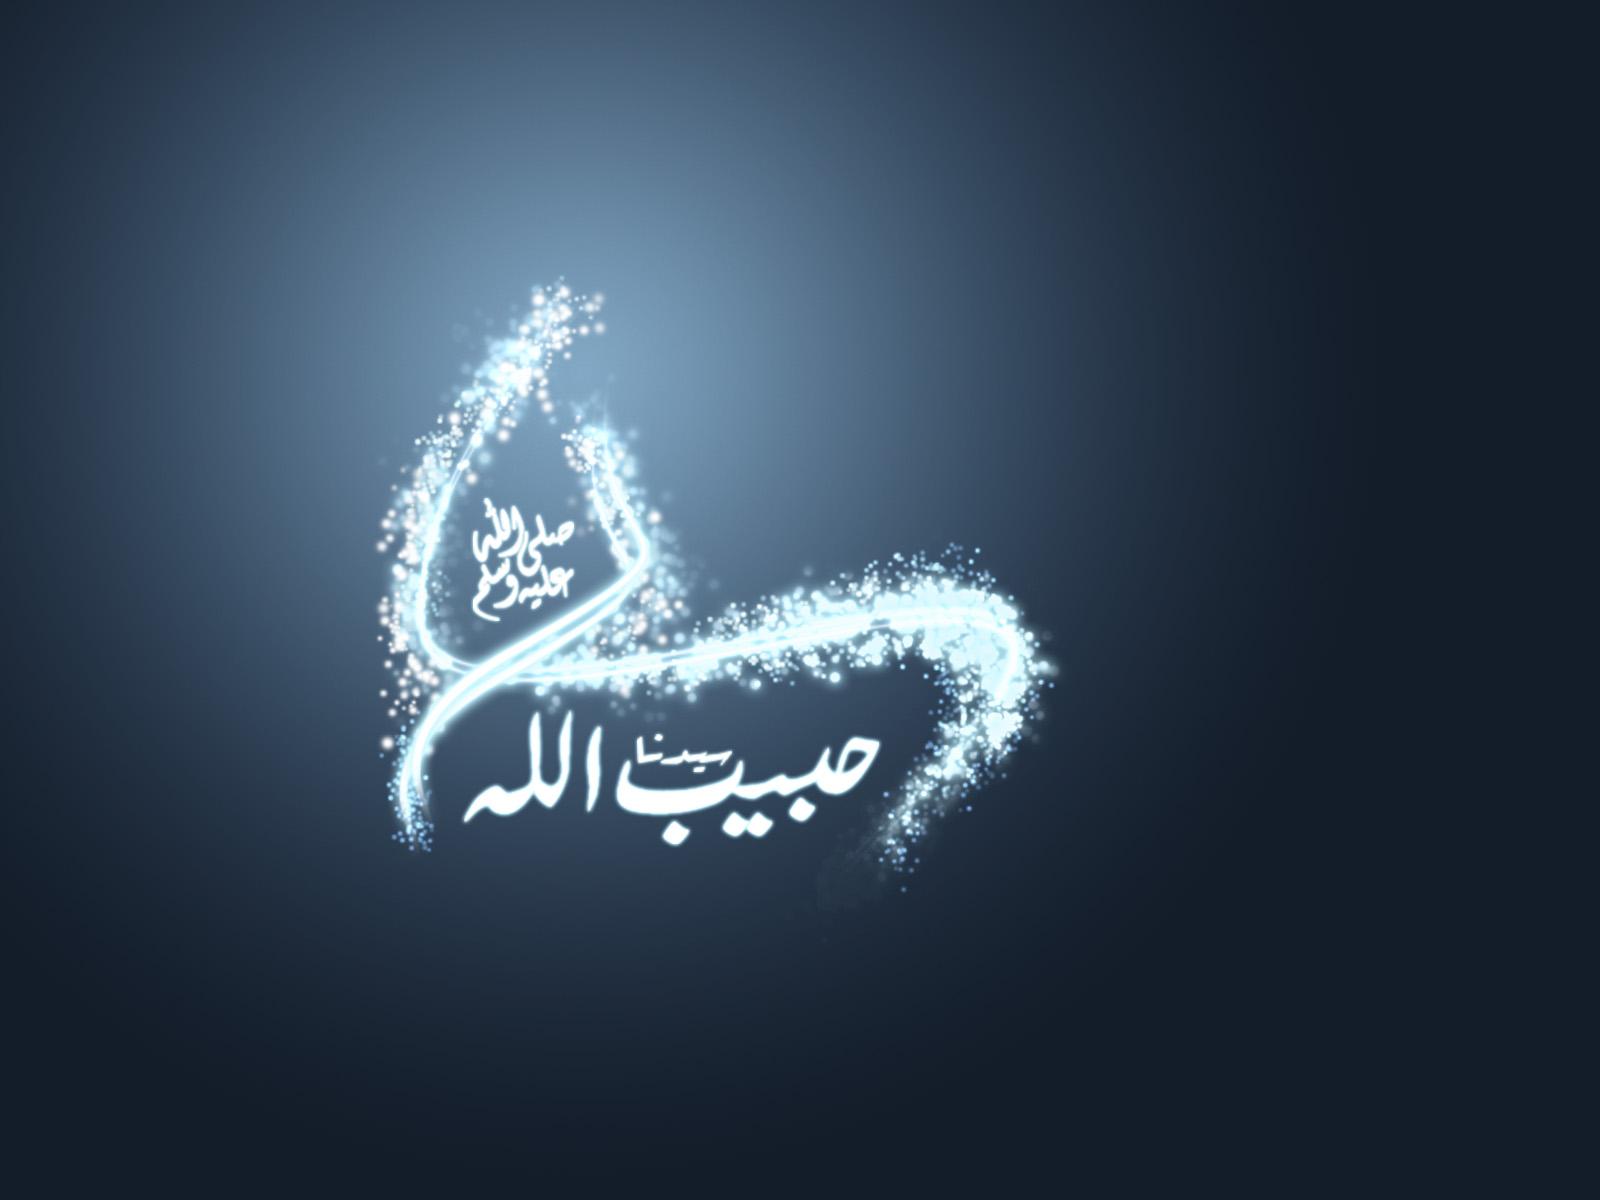 خلفيات باسم سيدنا محمد عليه افضل صلاه Islam_Prophet_of_Light_v_3_by_ahsanpervaiz